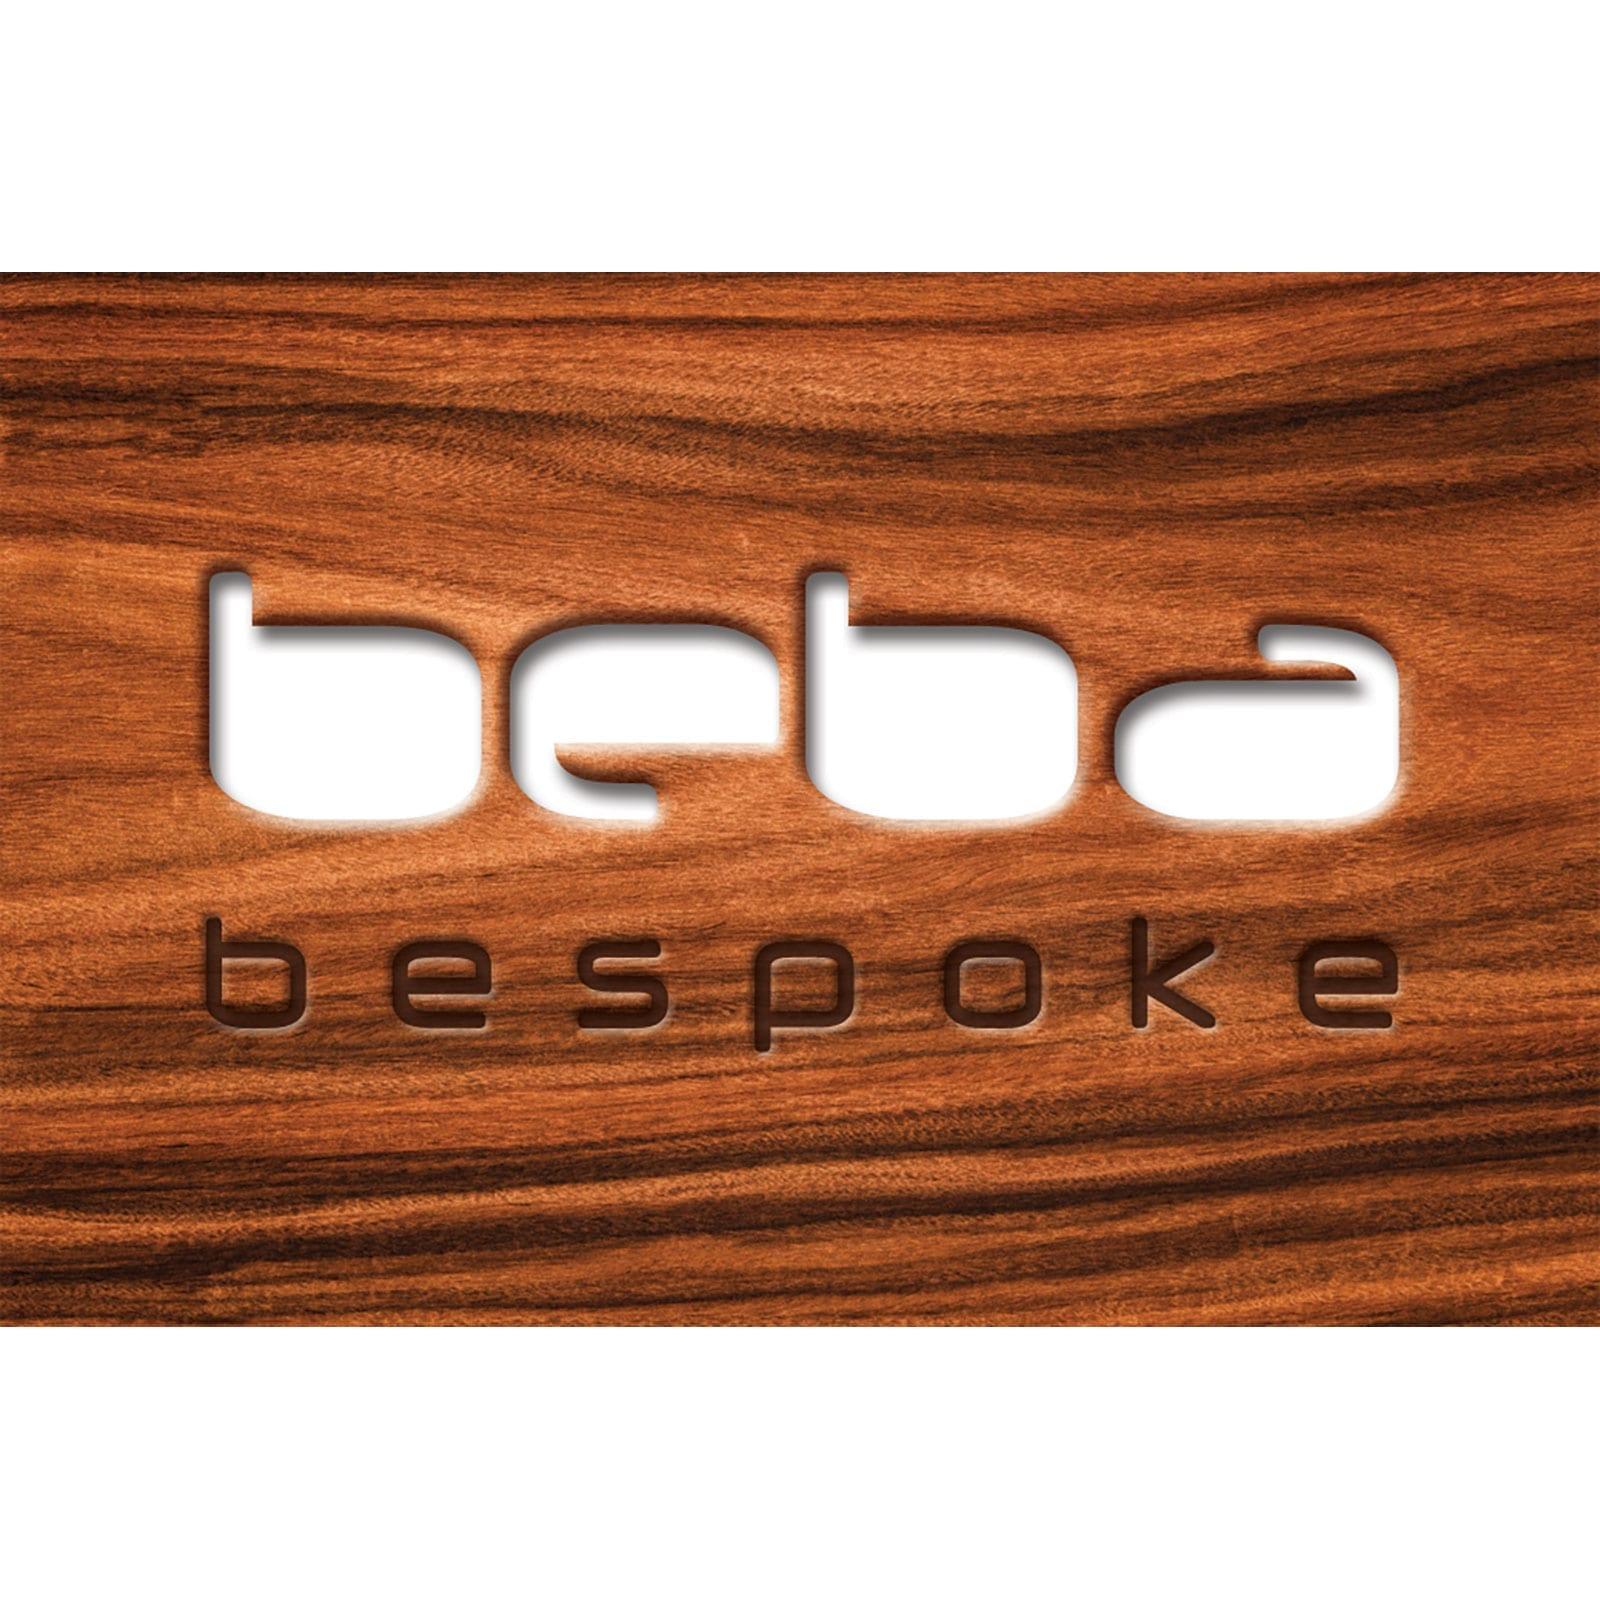 beba-logo-full-sq